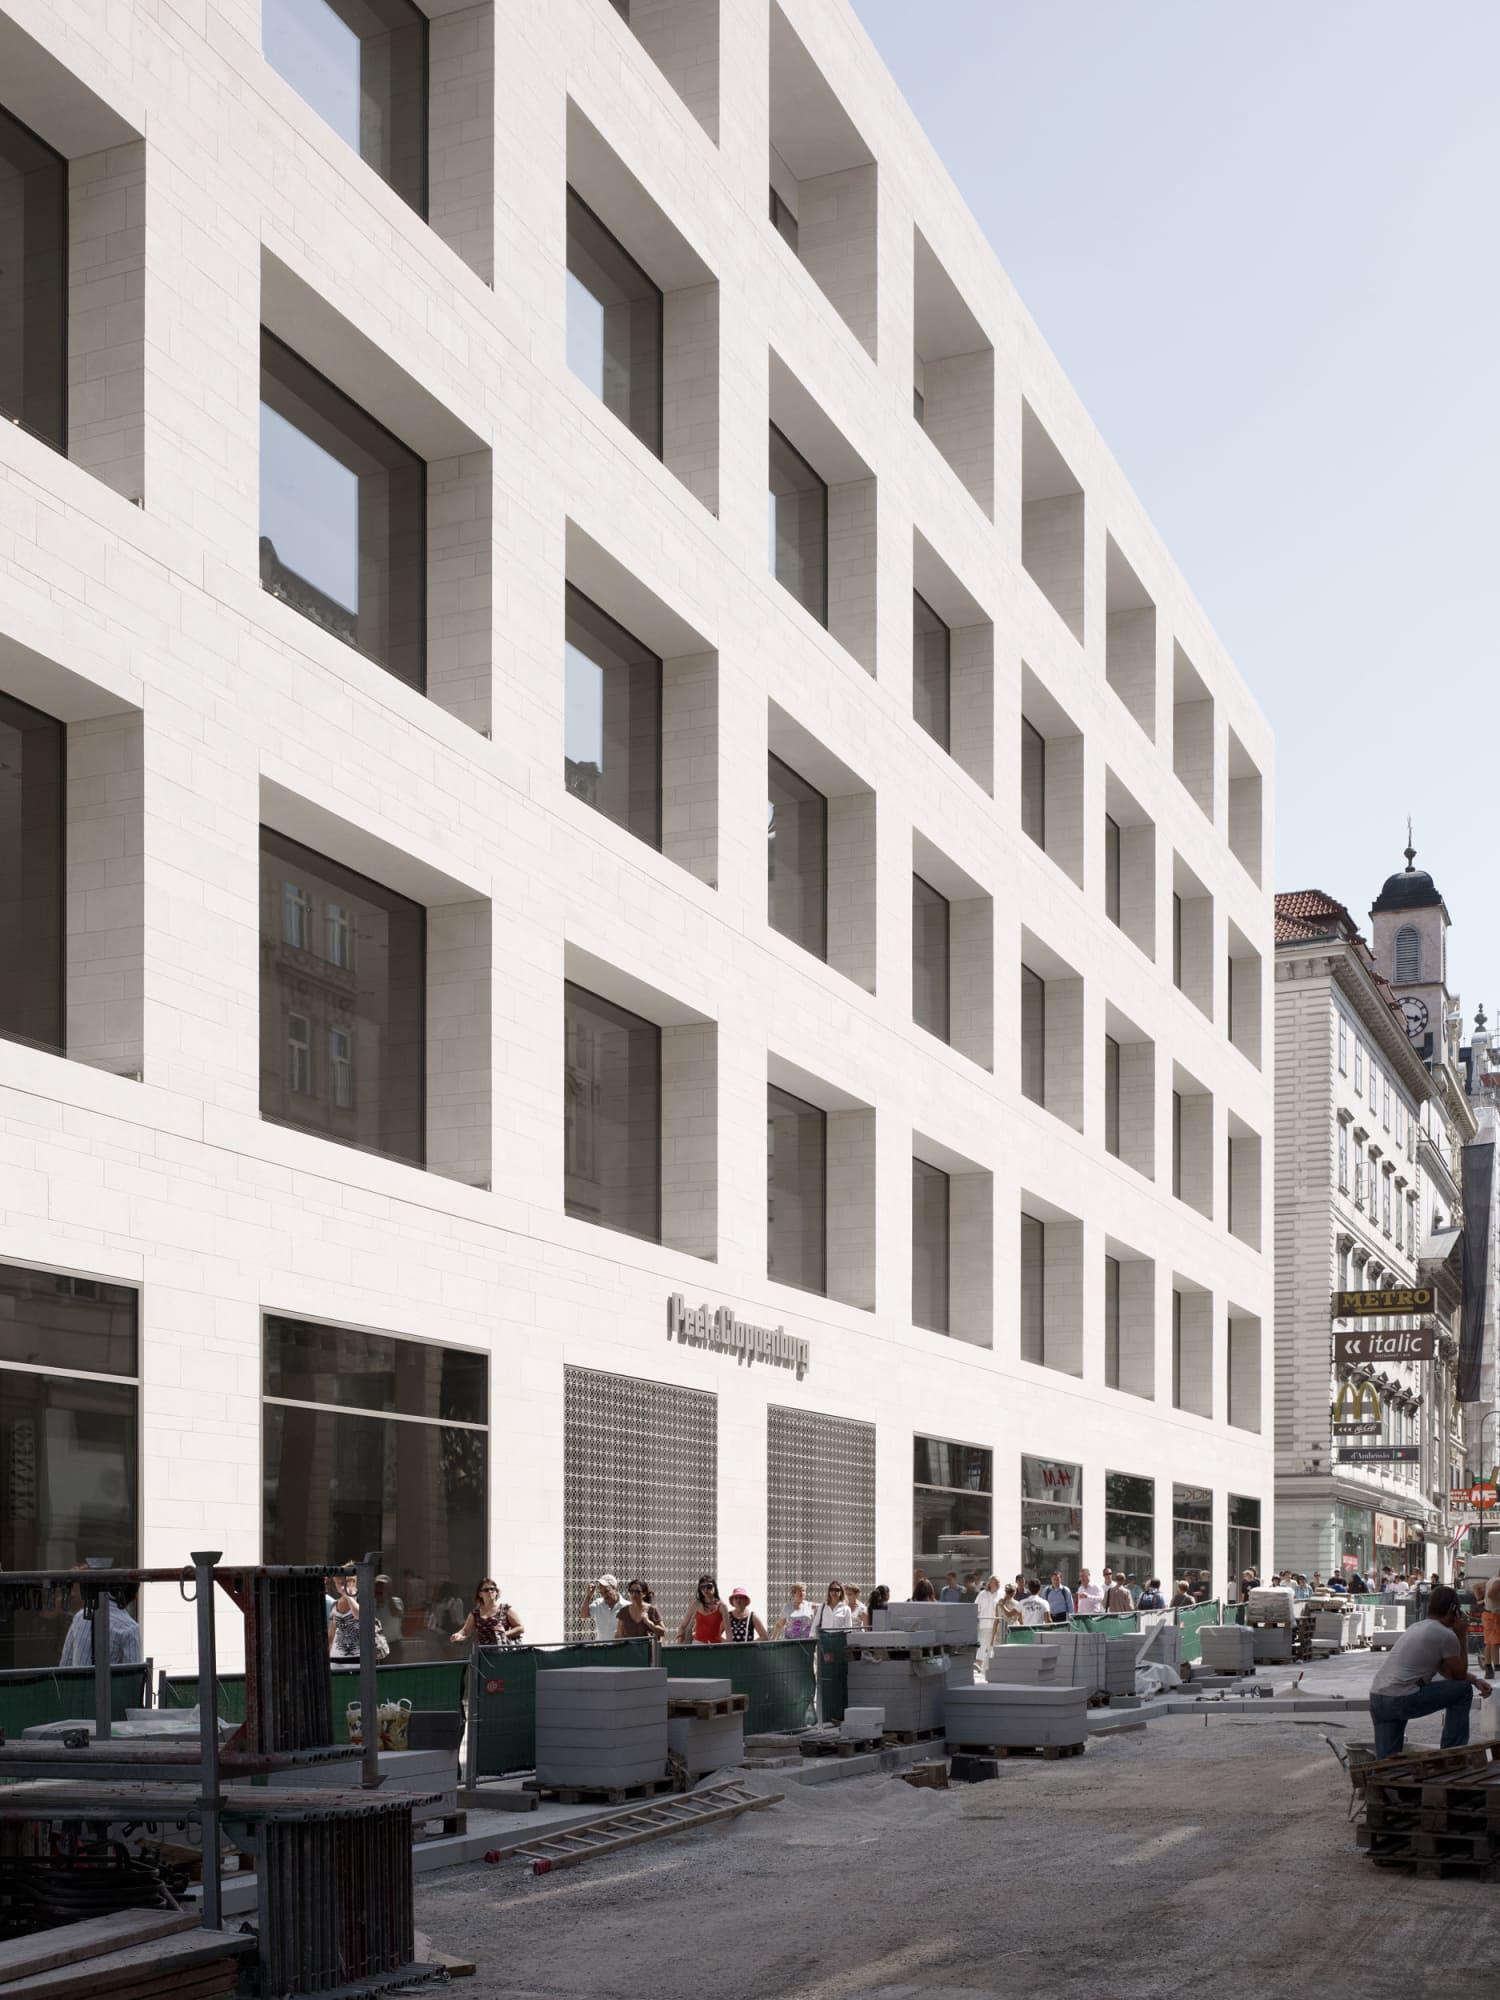 David Chipperfield Architects, hiepler, brunier, · Peek